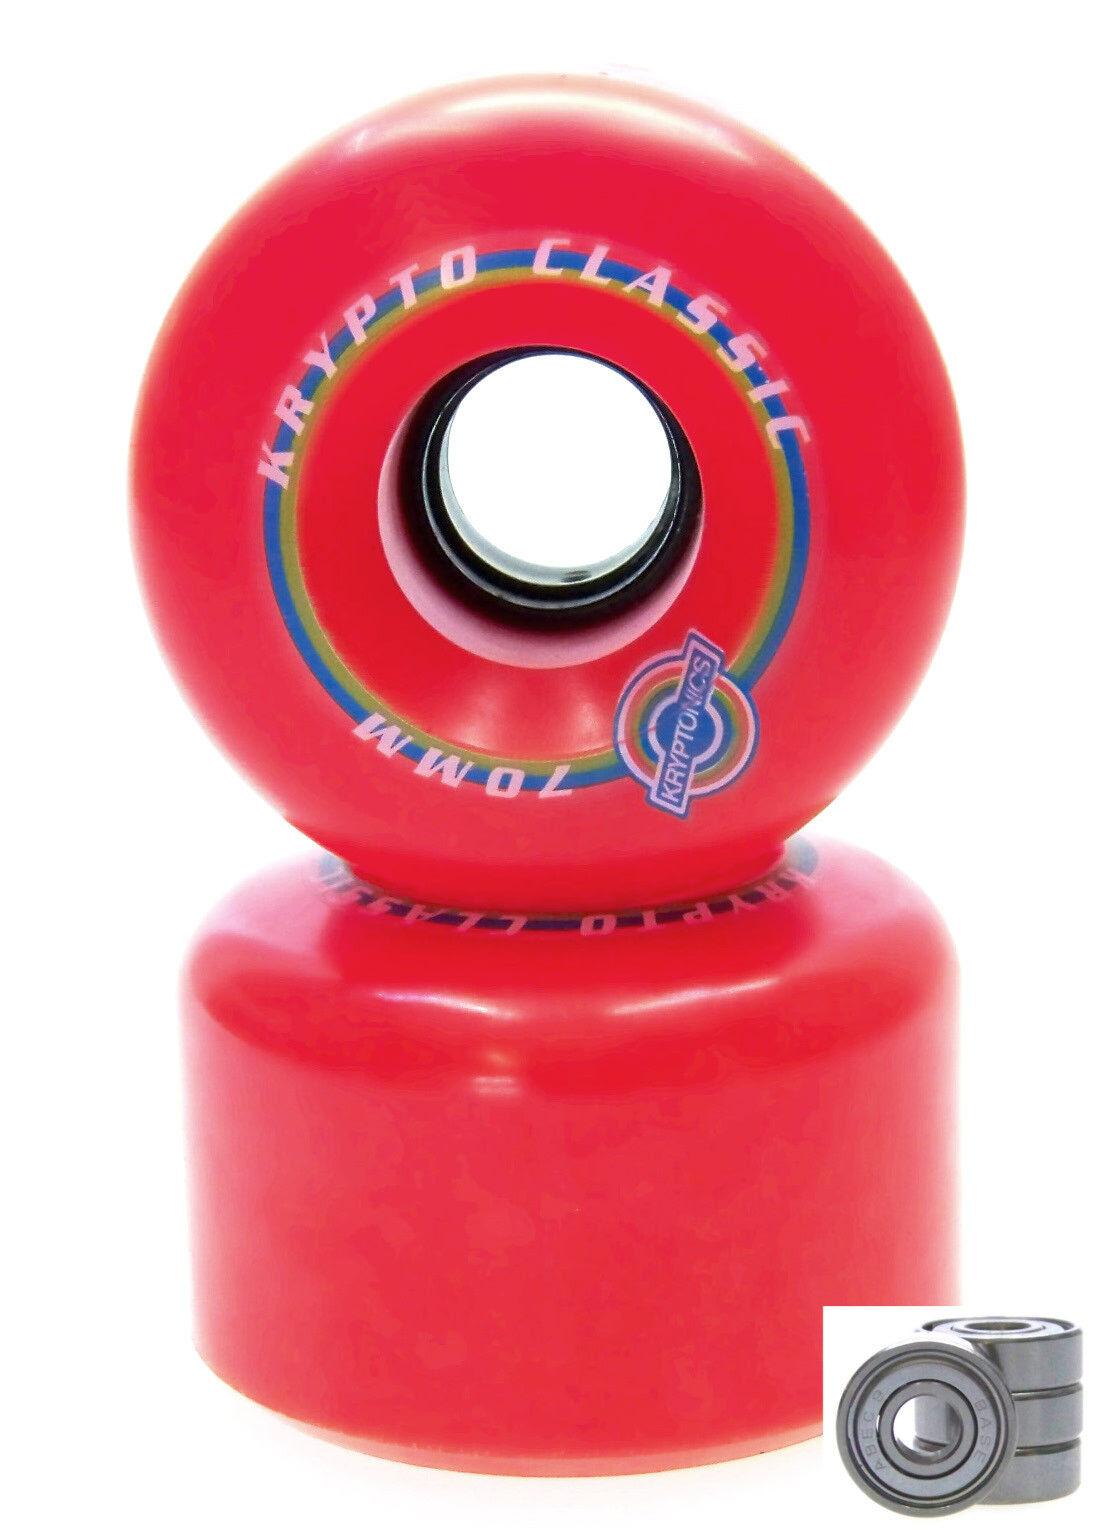 Longboard Rolle Kryptonics Classic 70mm / 78A Set ABEC Lager Set 78A Ersatzrolle ROT 44ef7e